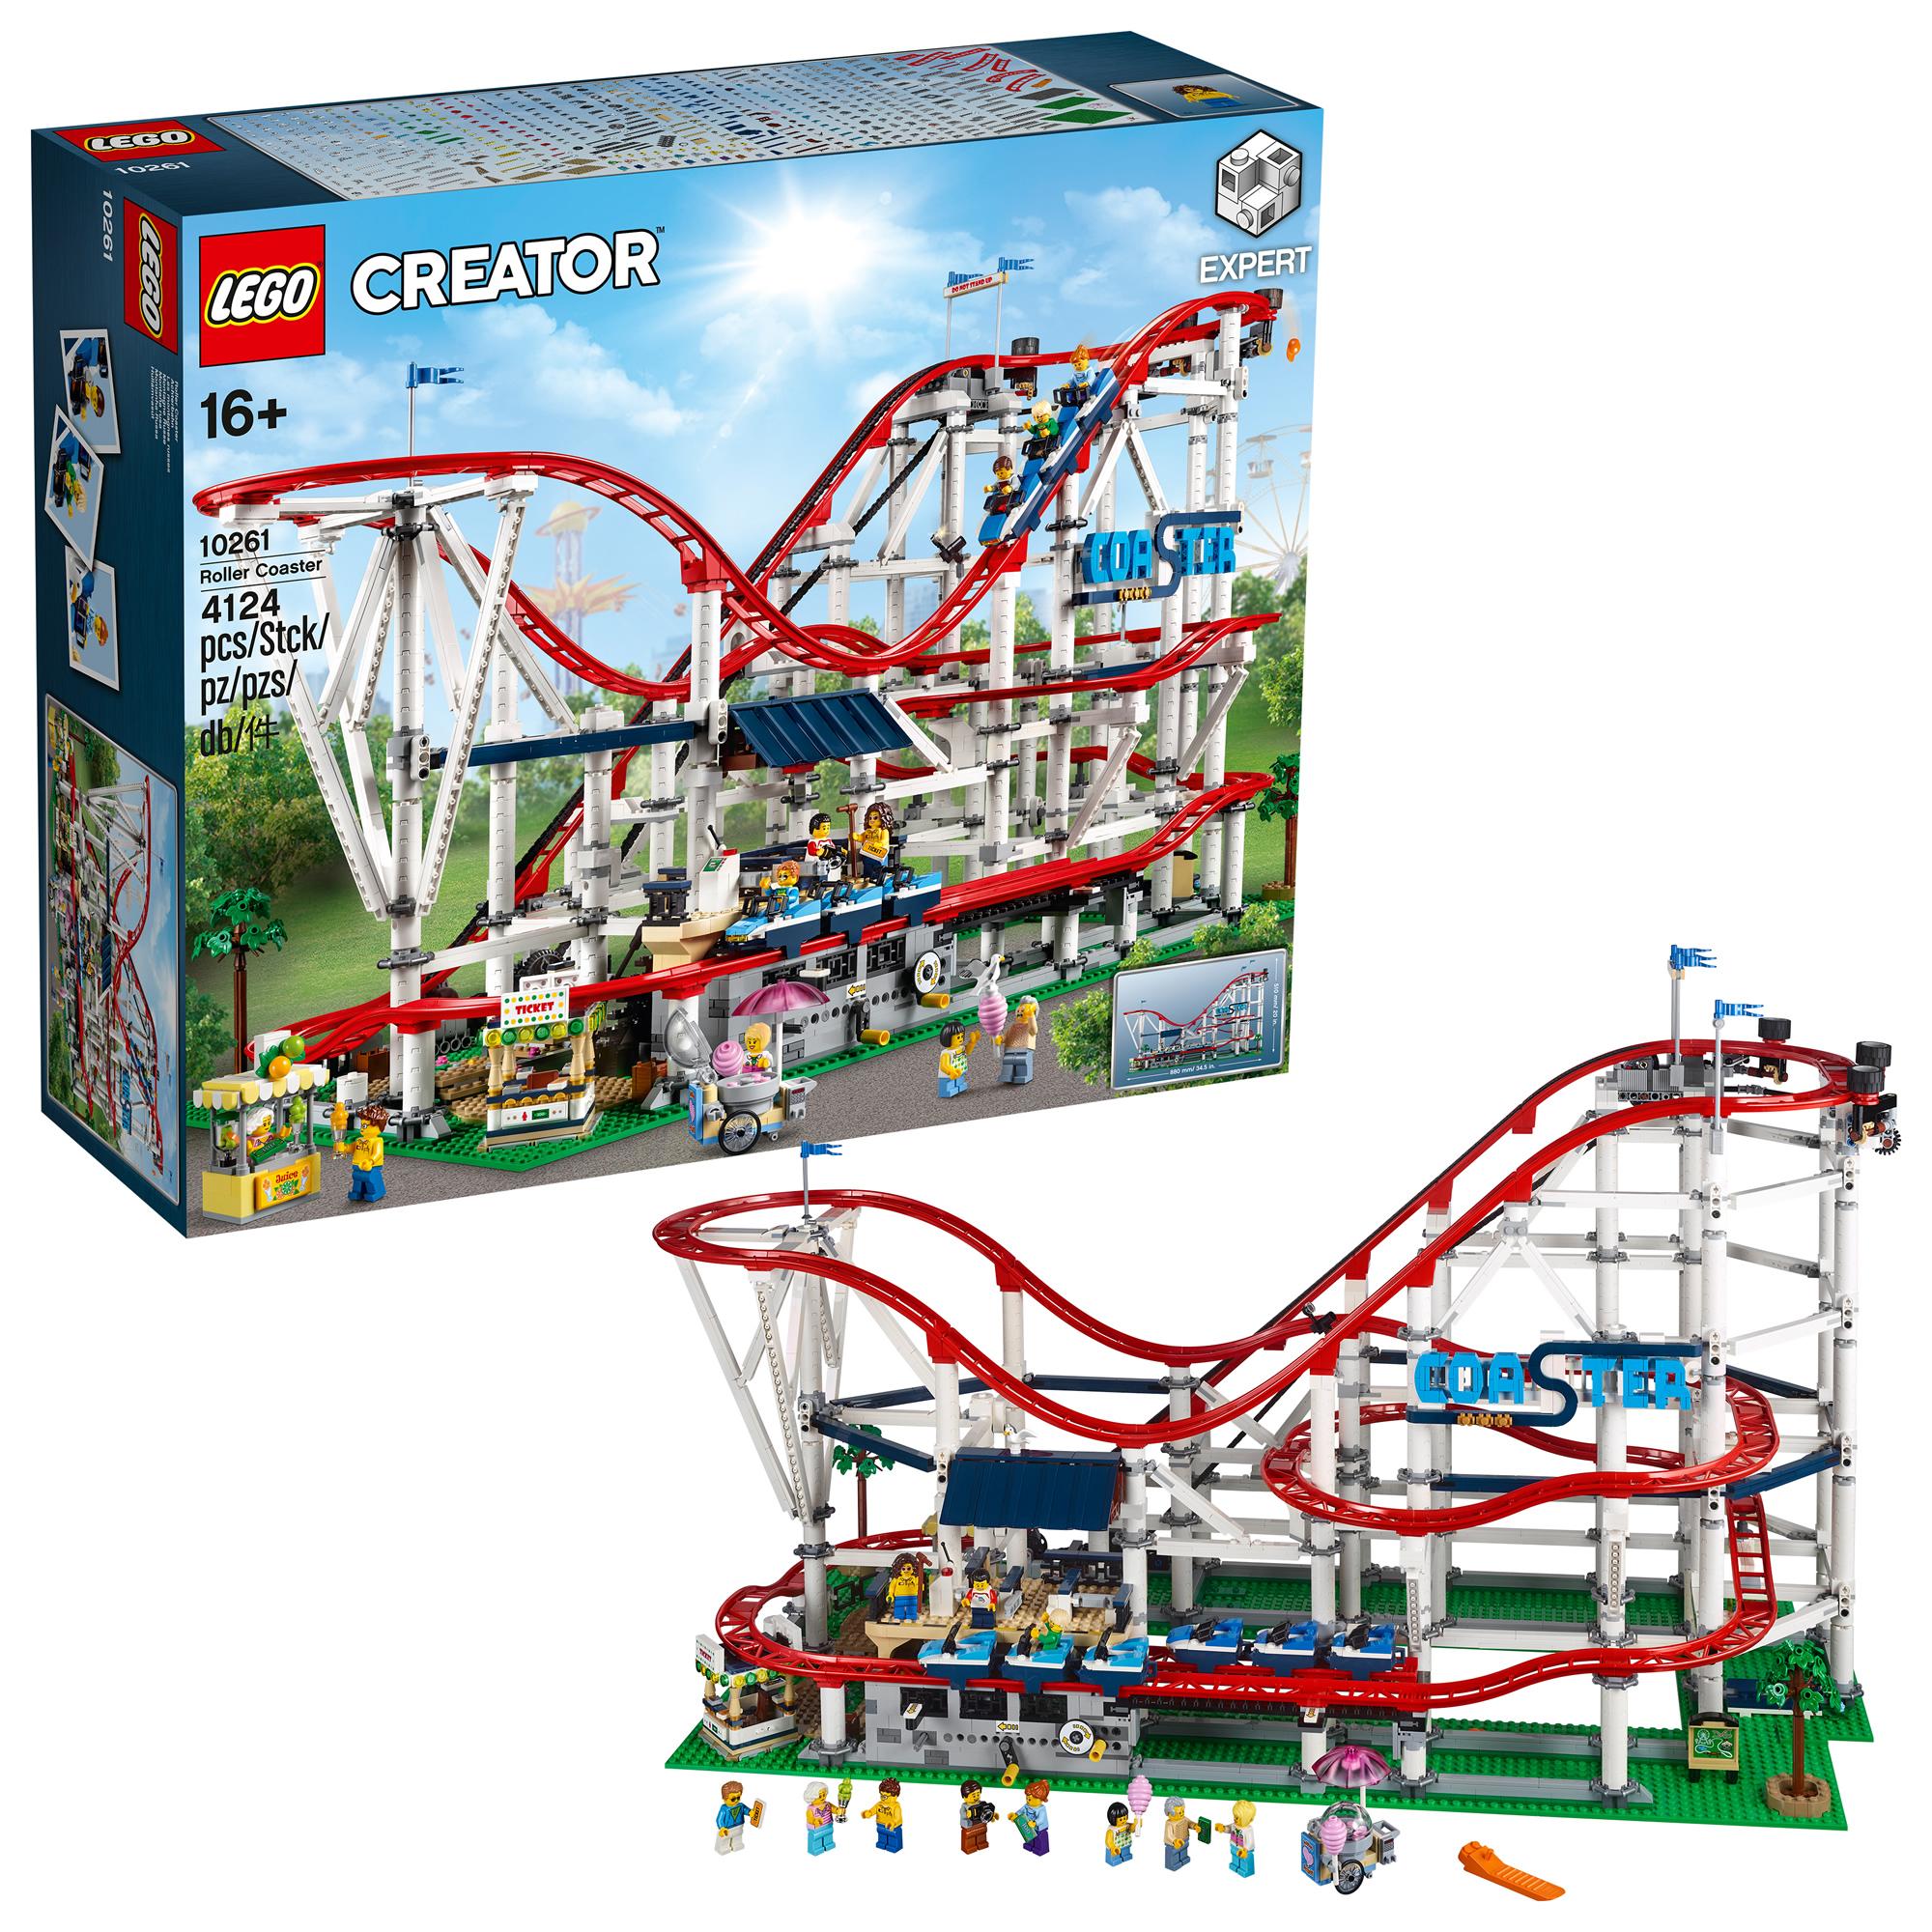 Lego creator expert- montagne russe - 10261 - LEGO CREATOR EXPERT